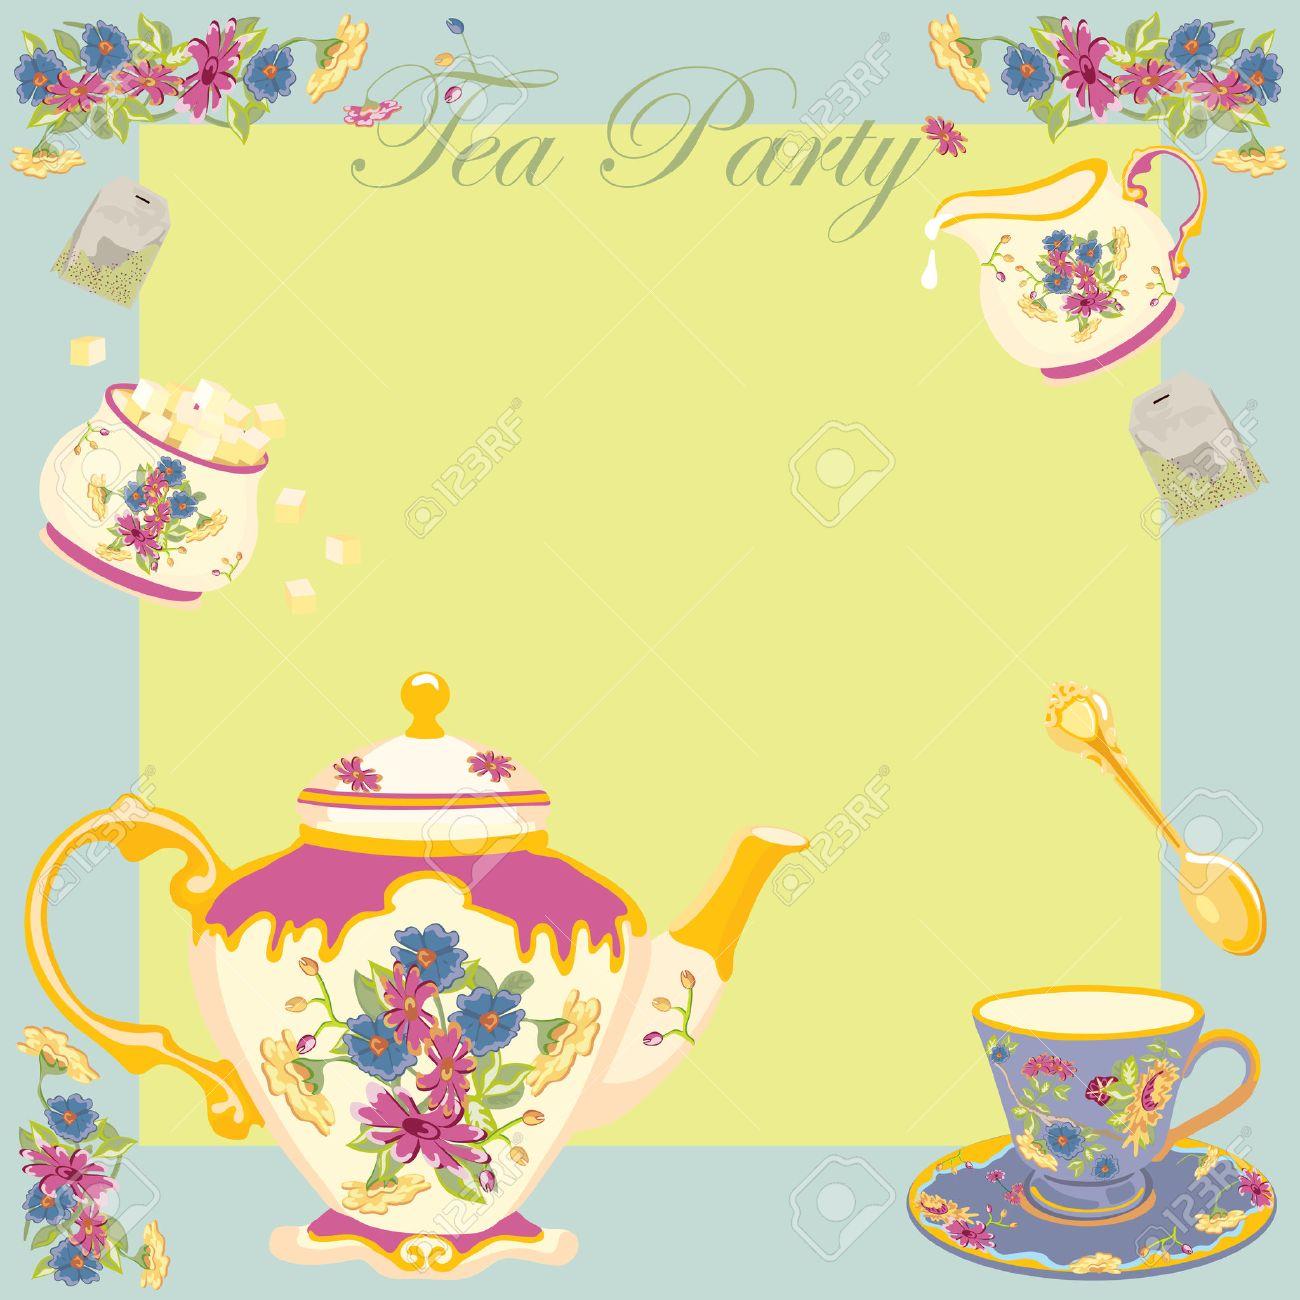 Elegant tea party invitation template with teacups cartoon vector - Tea Party Tea Party Or Garden Party Invitation Illustration